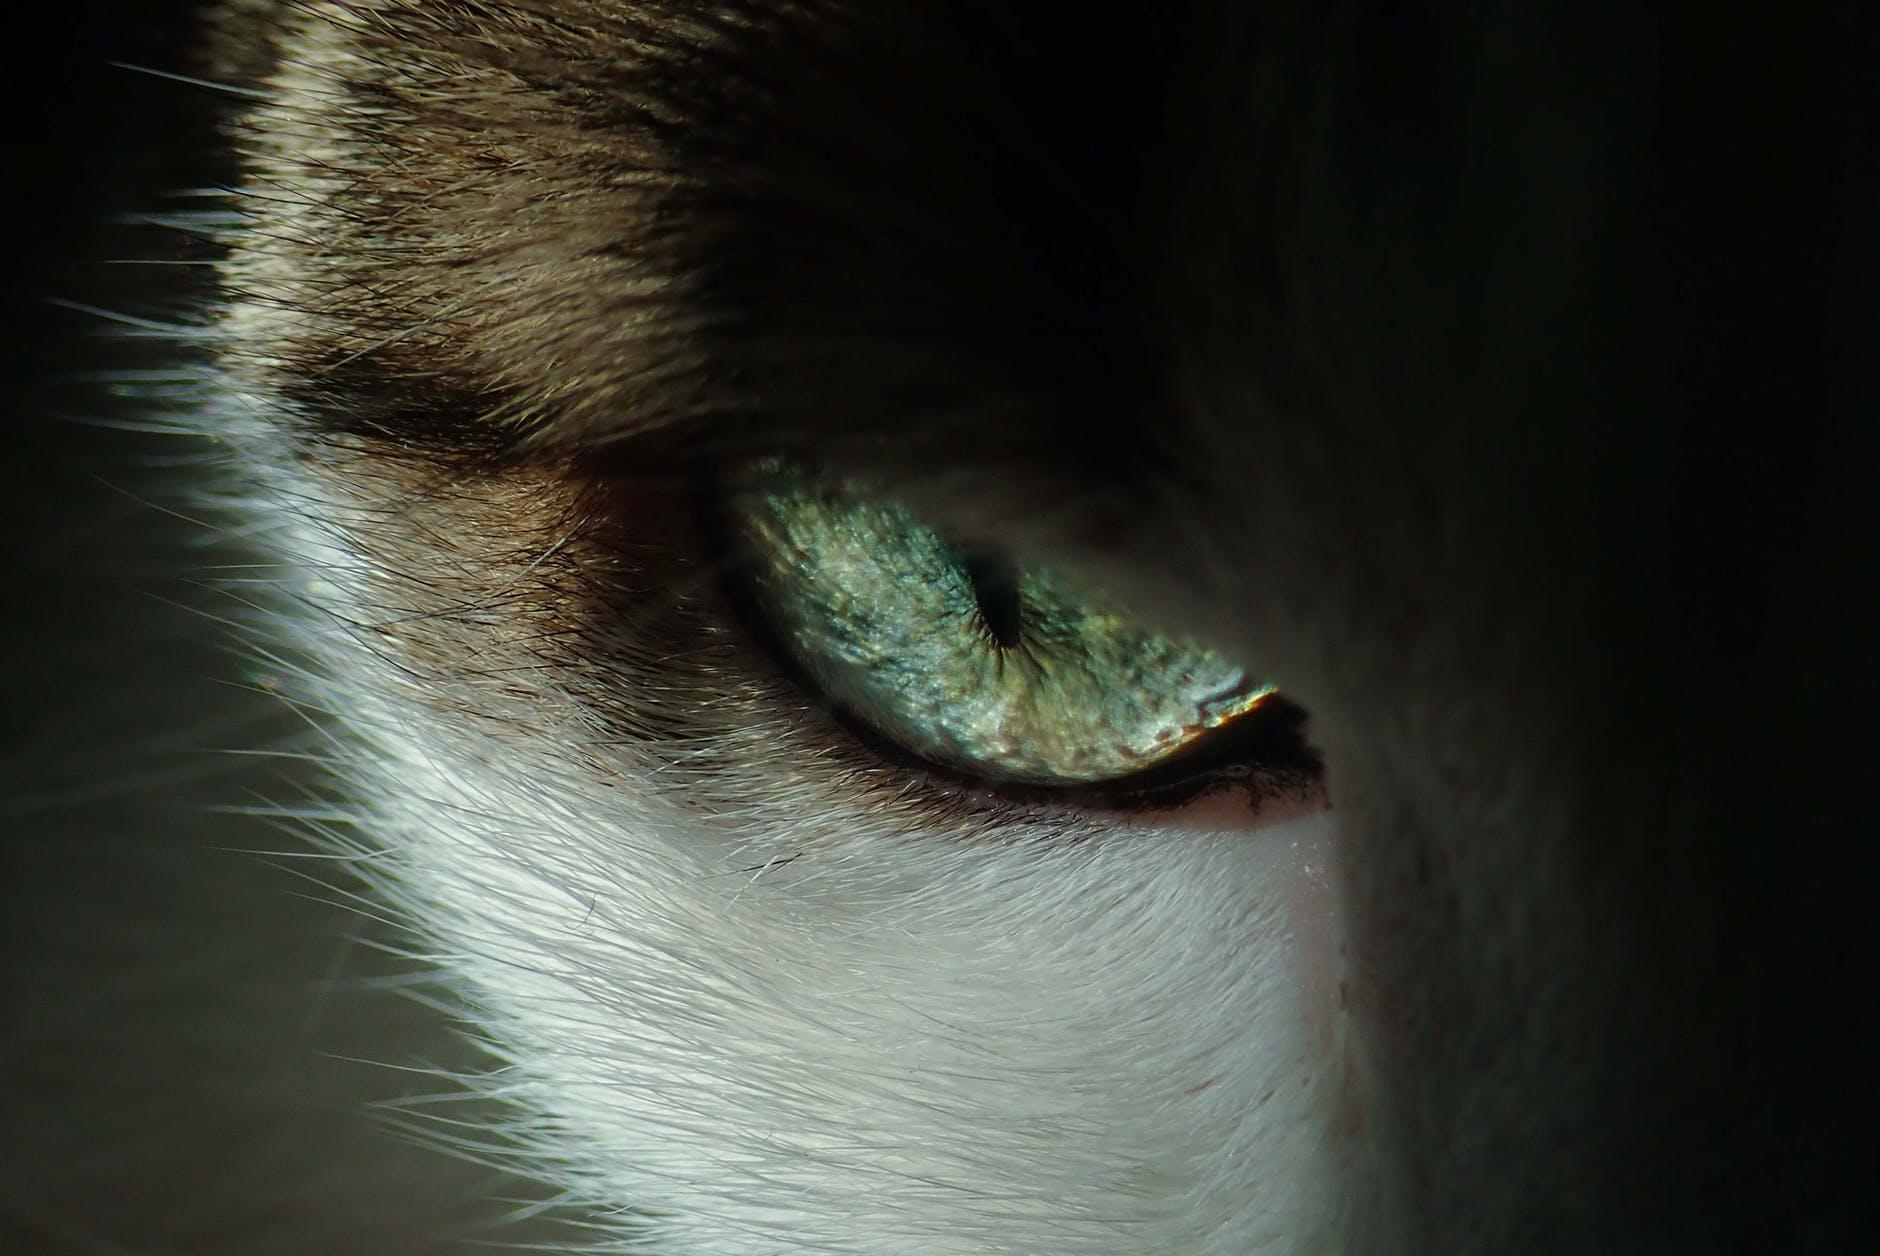 close up photo of cat s eye